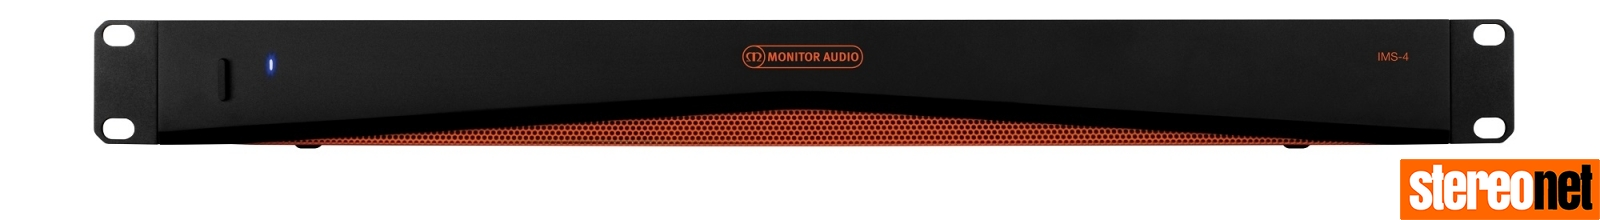 Monitor Audio IMS-4 Streamer